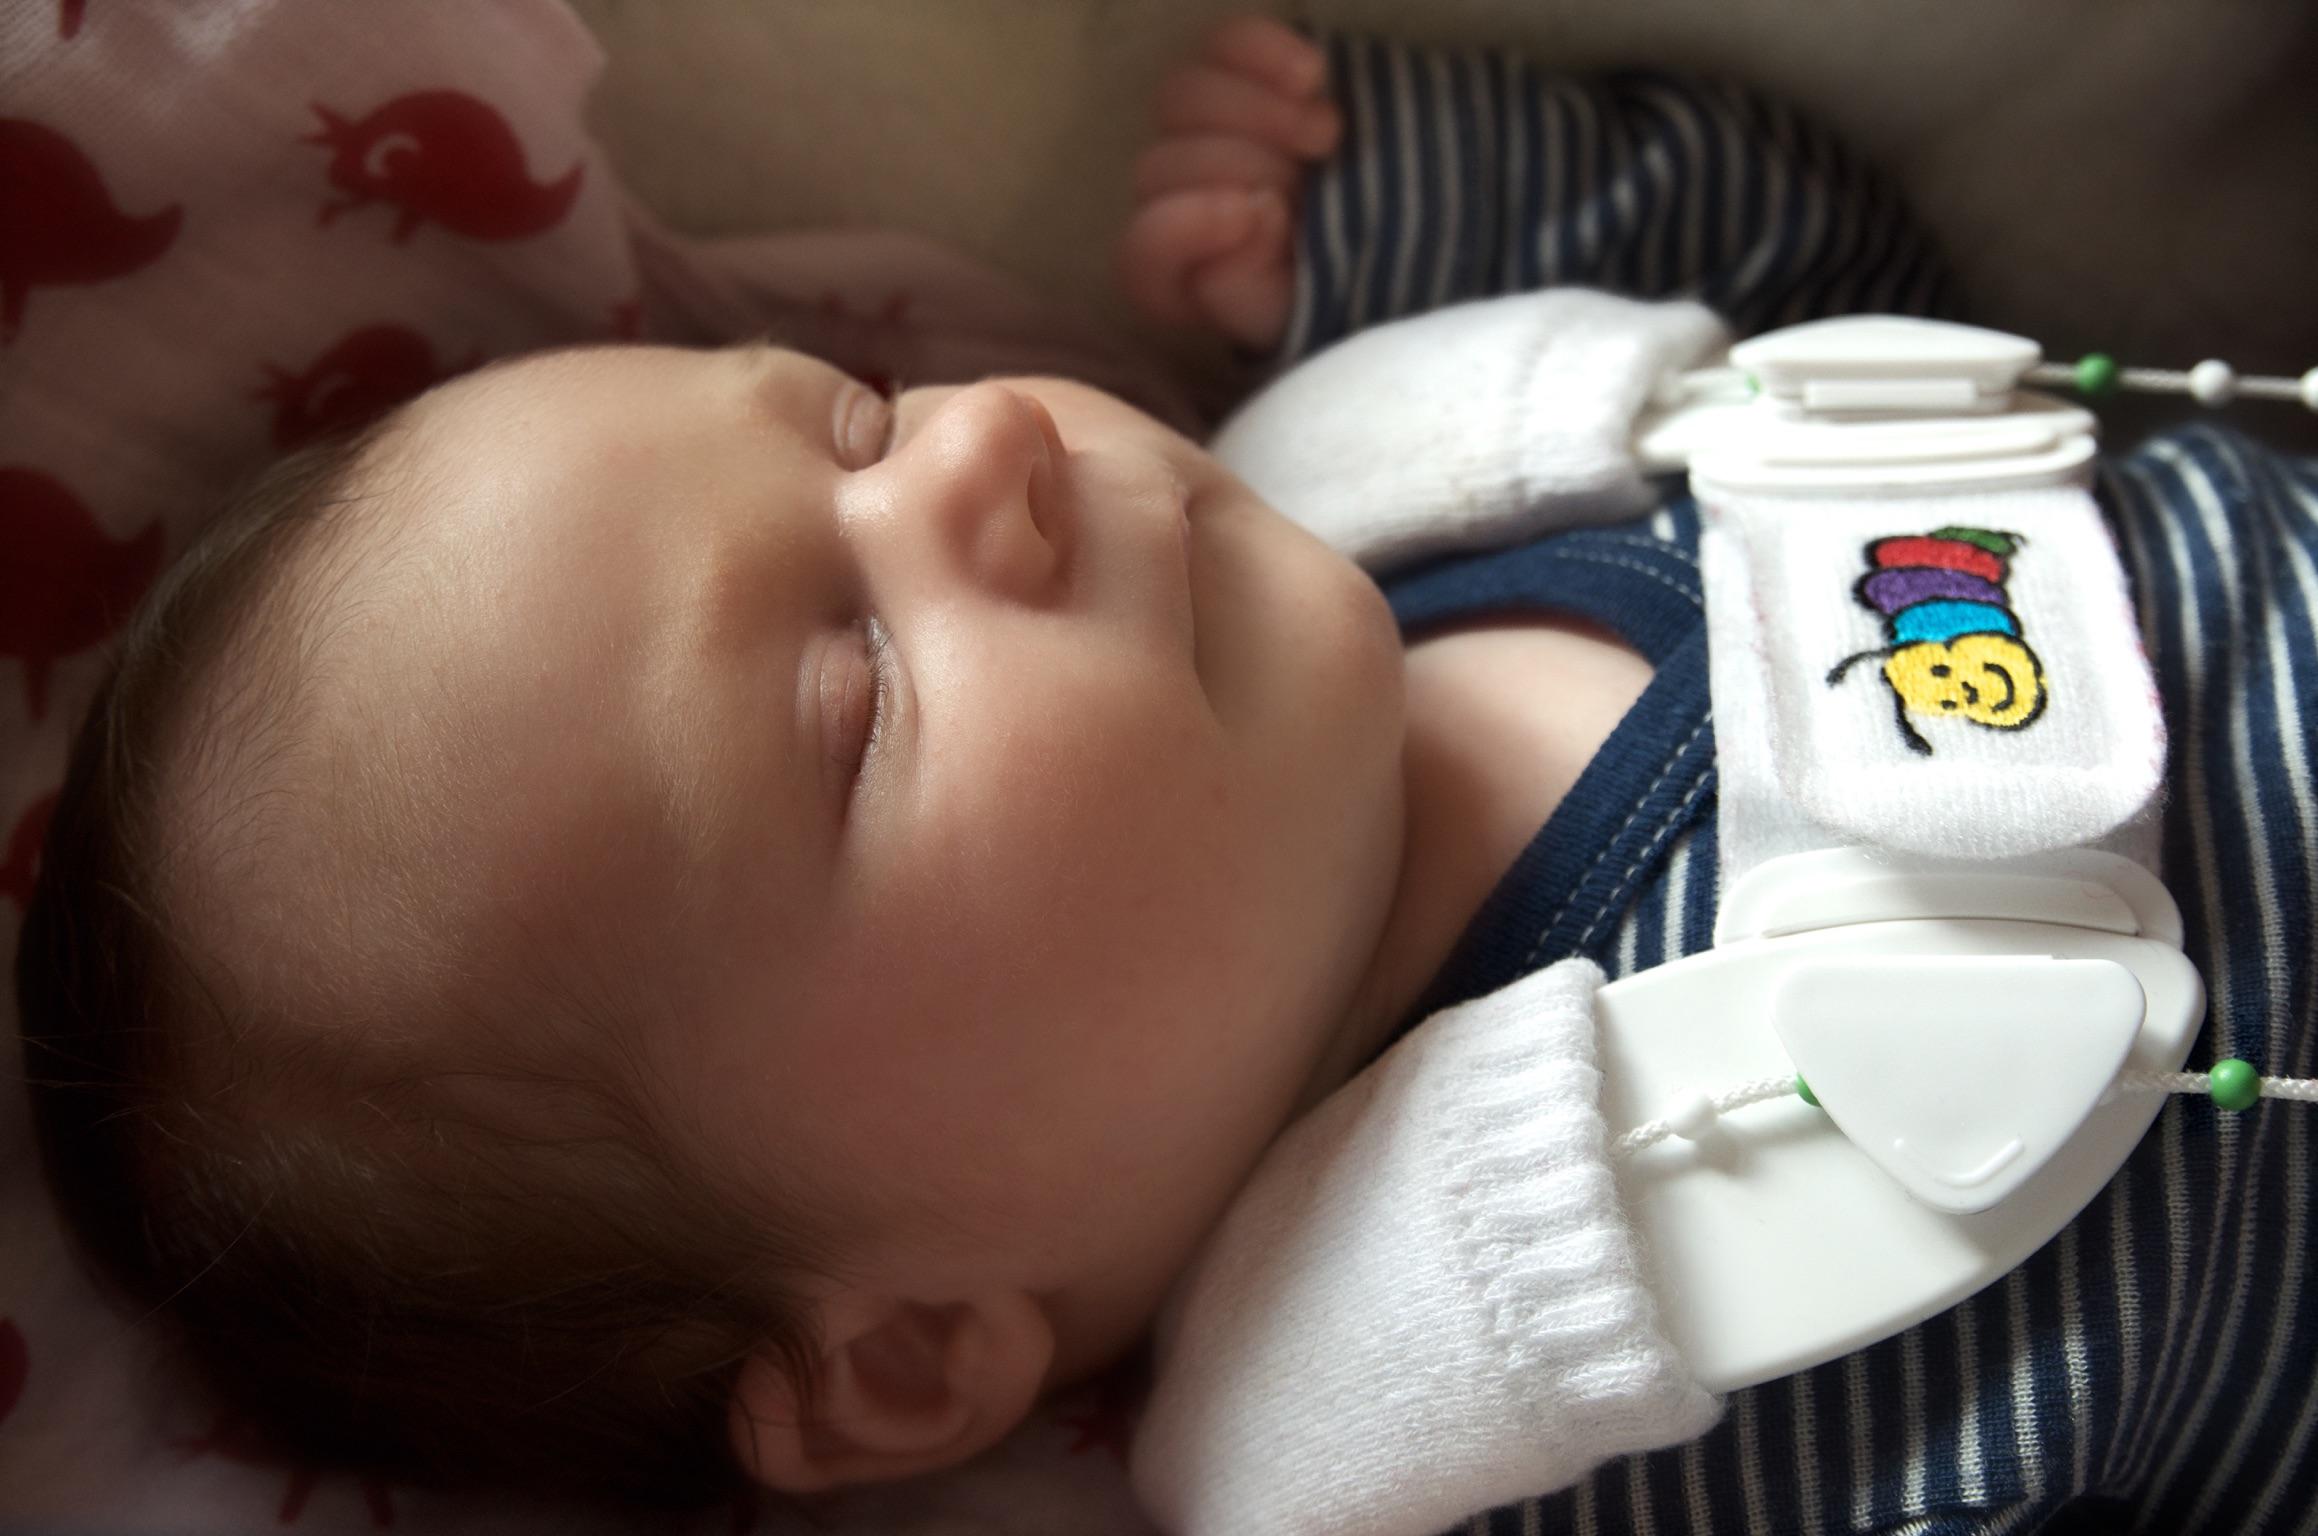 Tübinger Hüftbeugeschiene Neugeborenes #DankDir Danke Hebamme